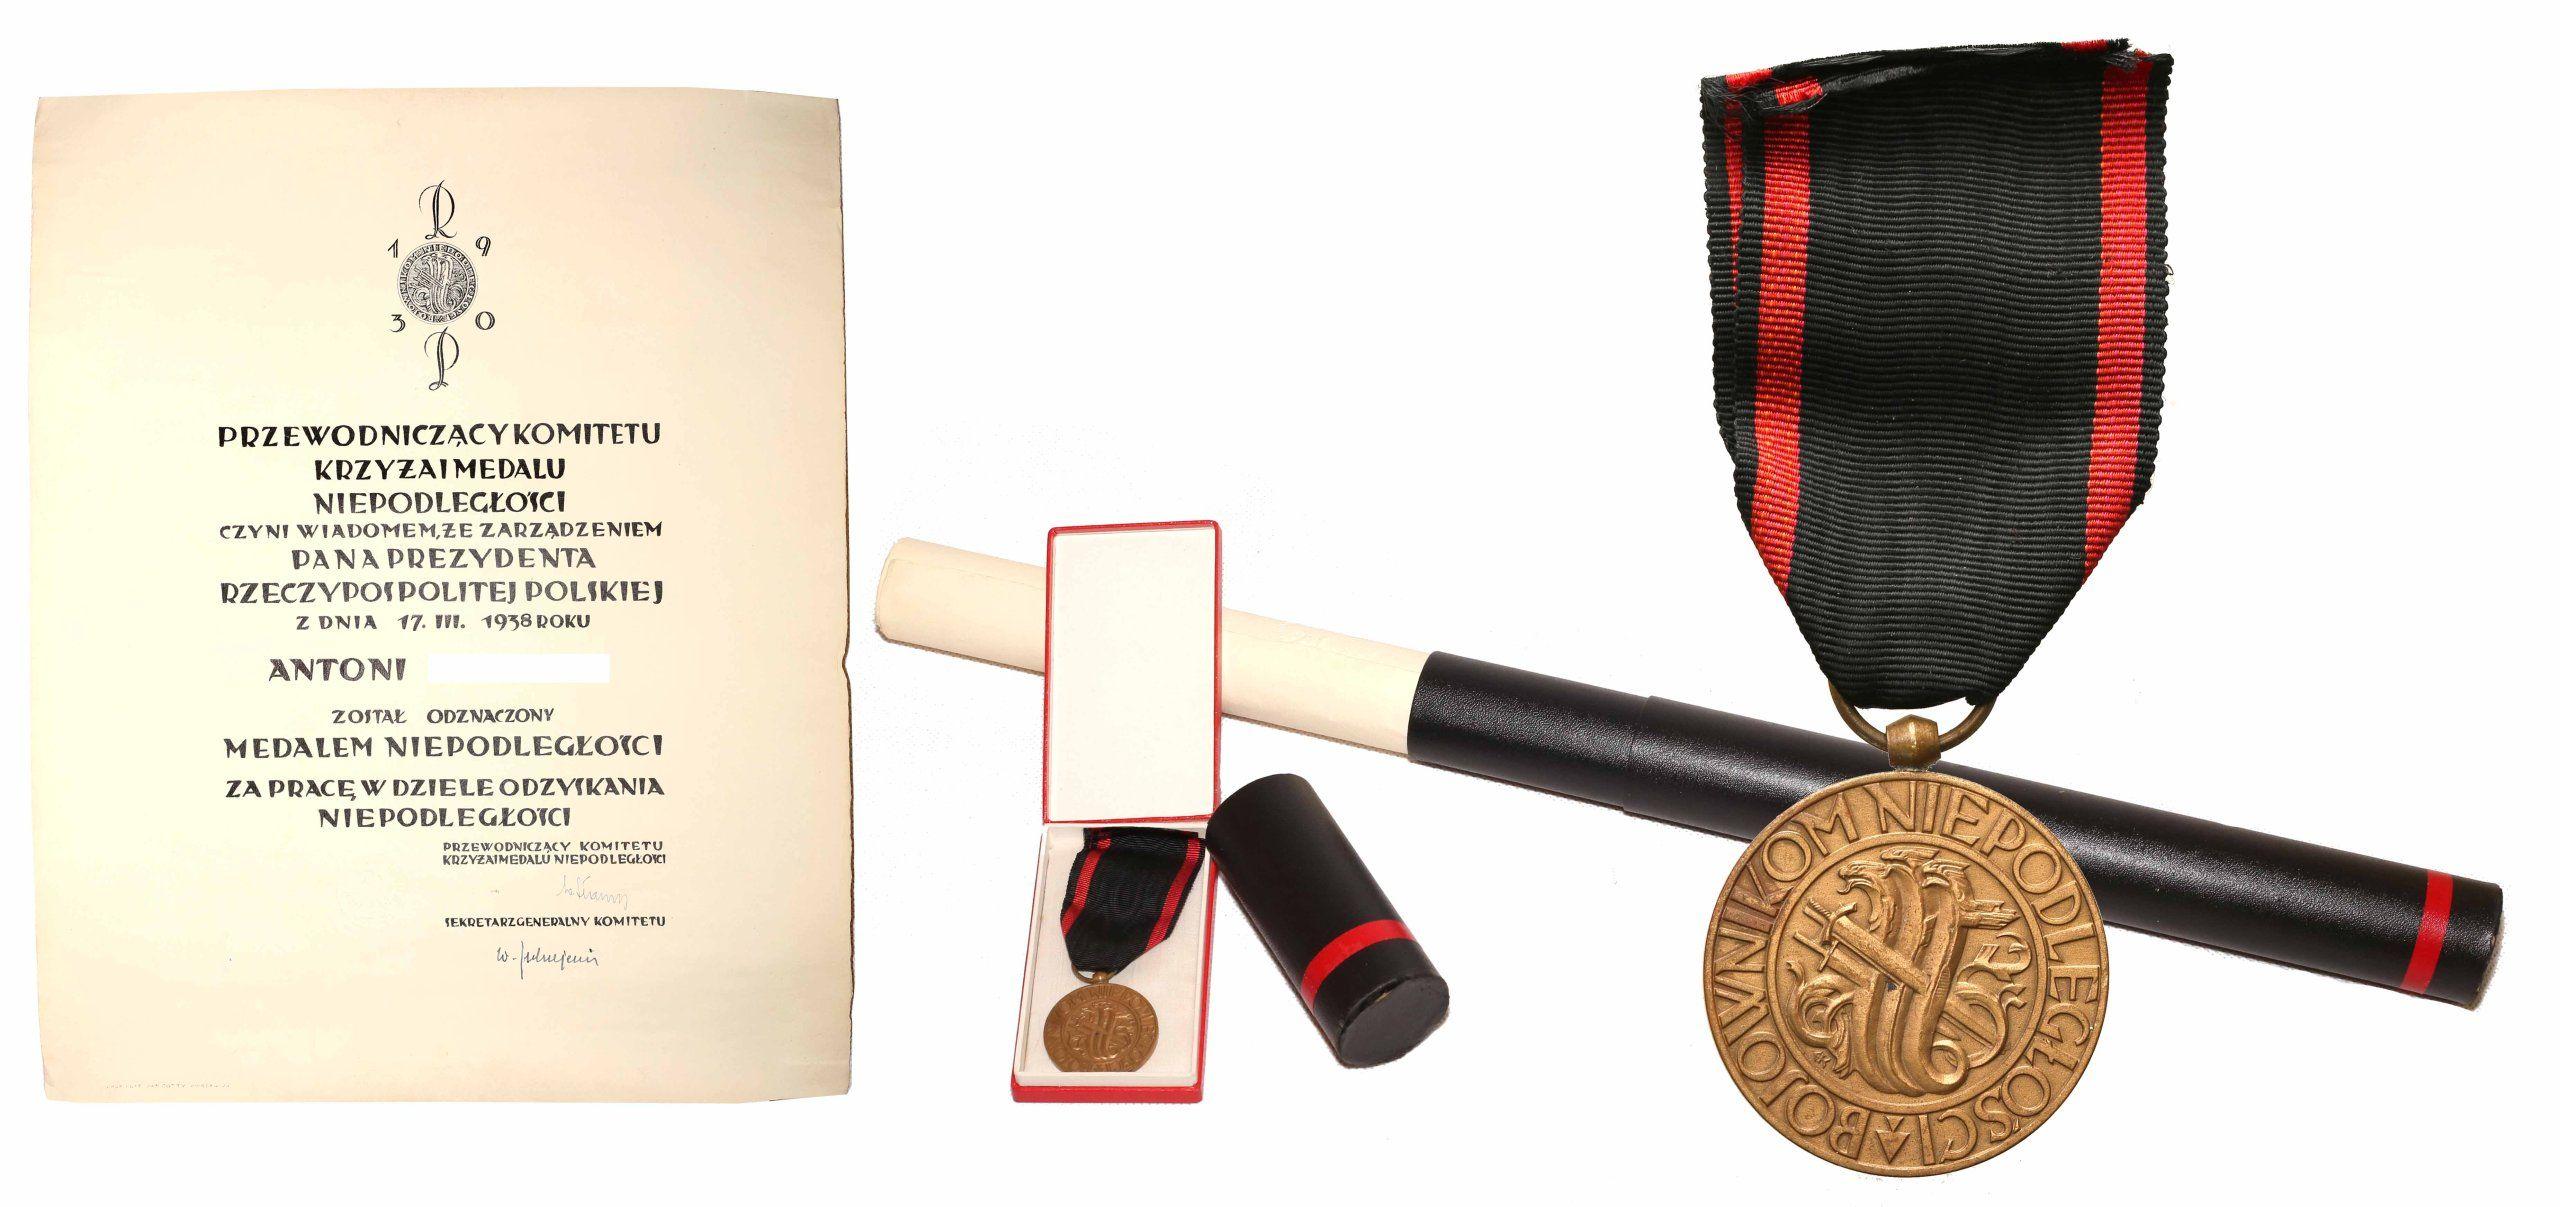 Medal Niepodleglosci Nadanie 1938 Rzadkie 6769306389 Oficjalne Archiwum Allegro Medals